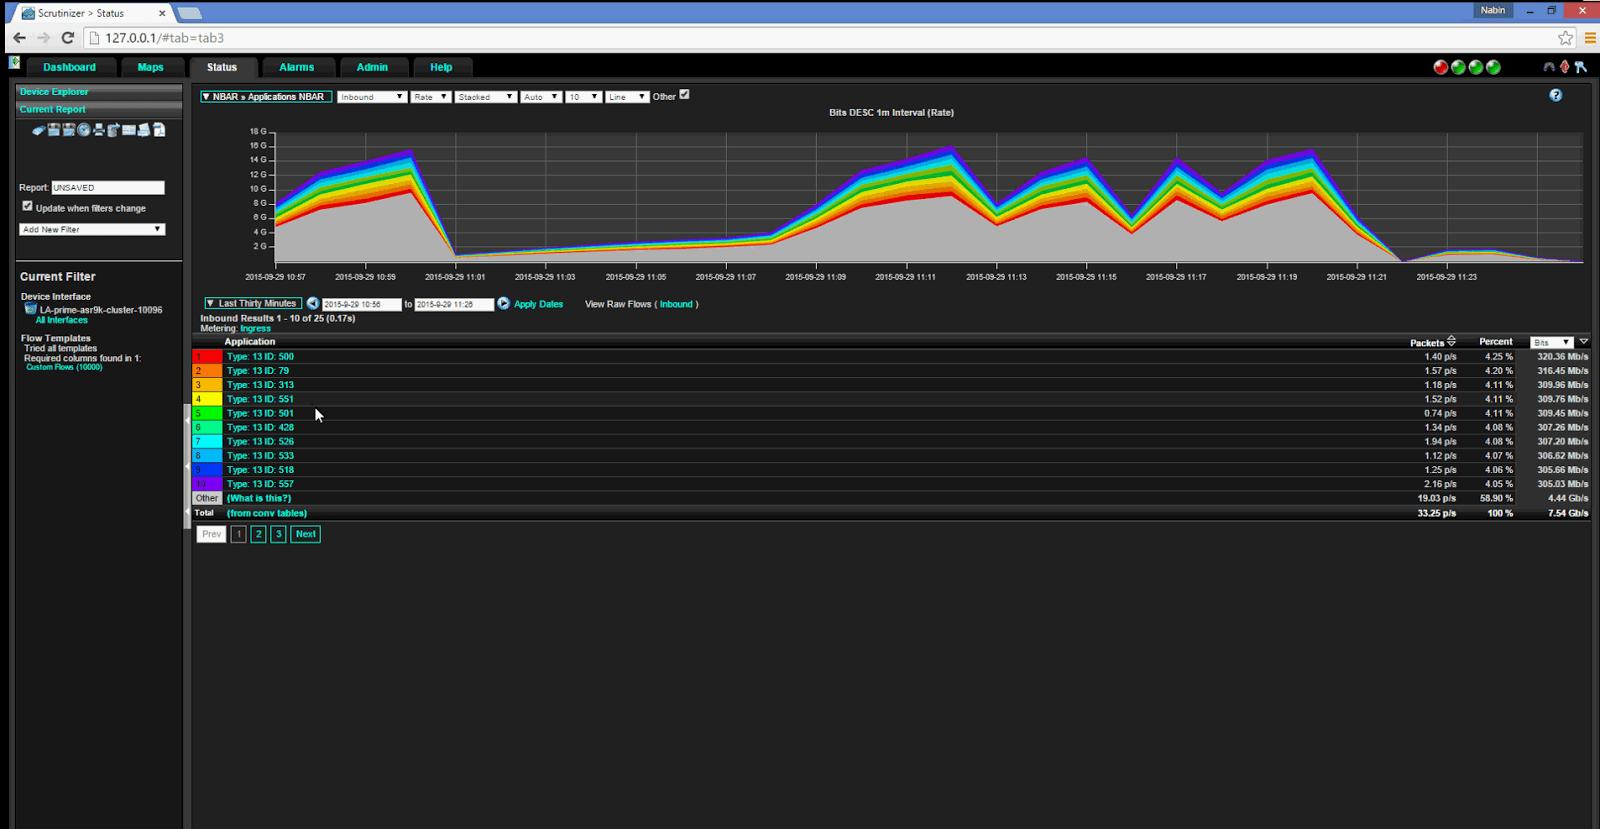 Netflow Kibana Setup